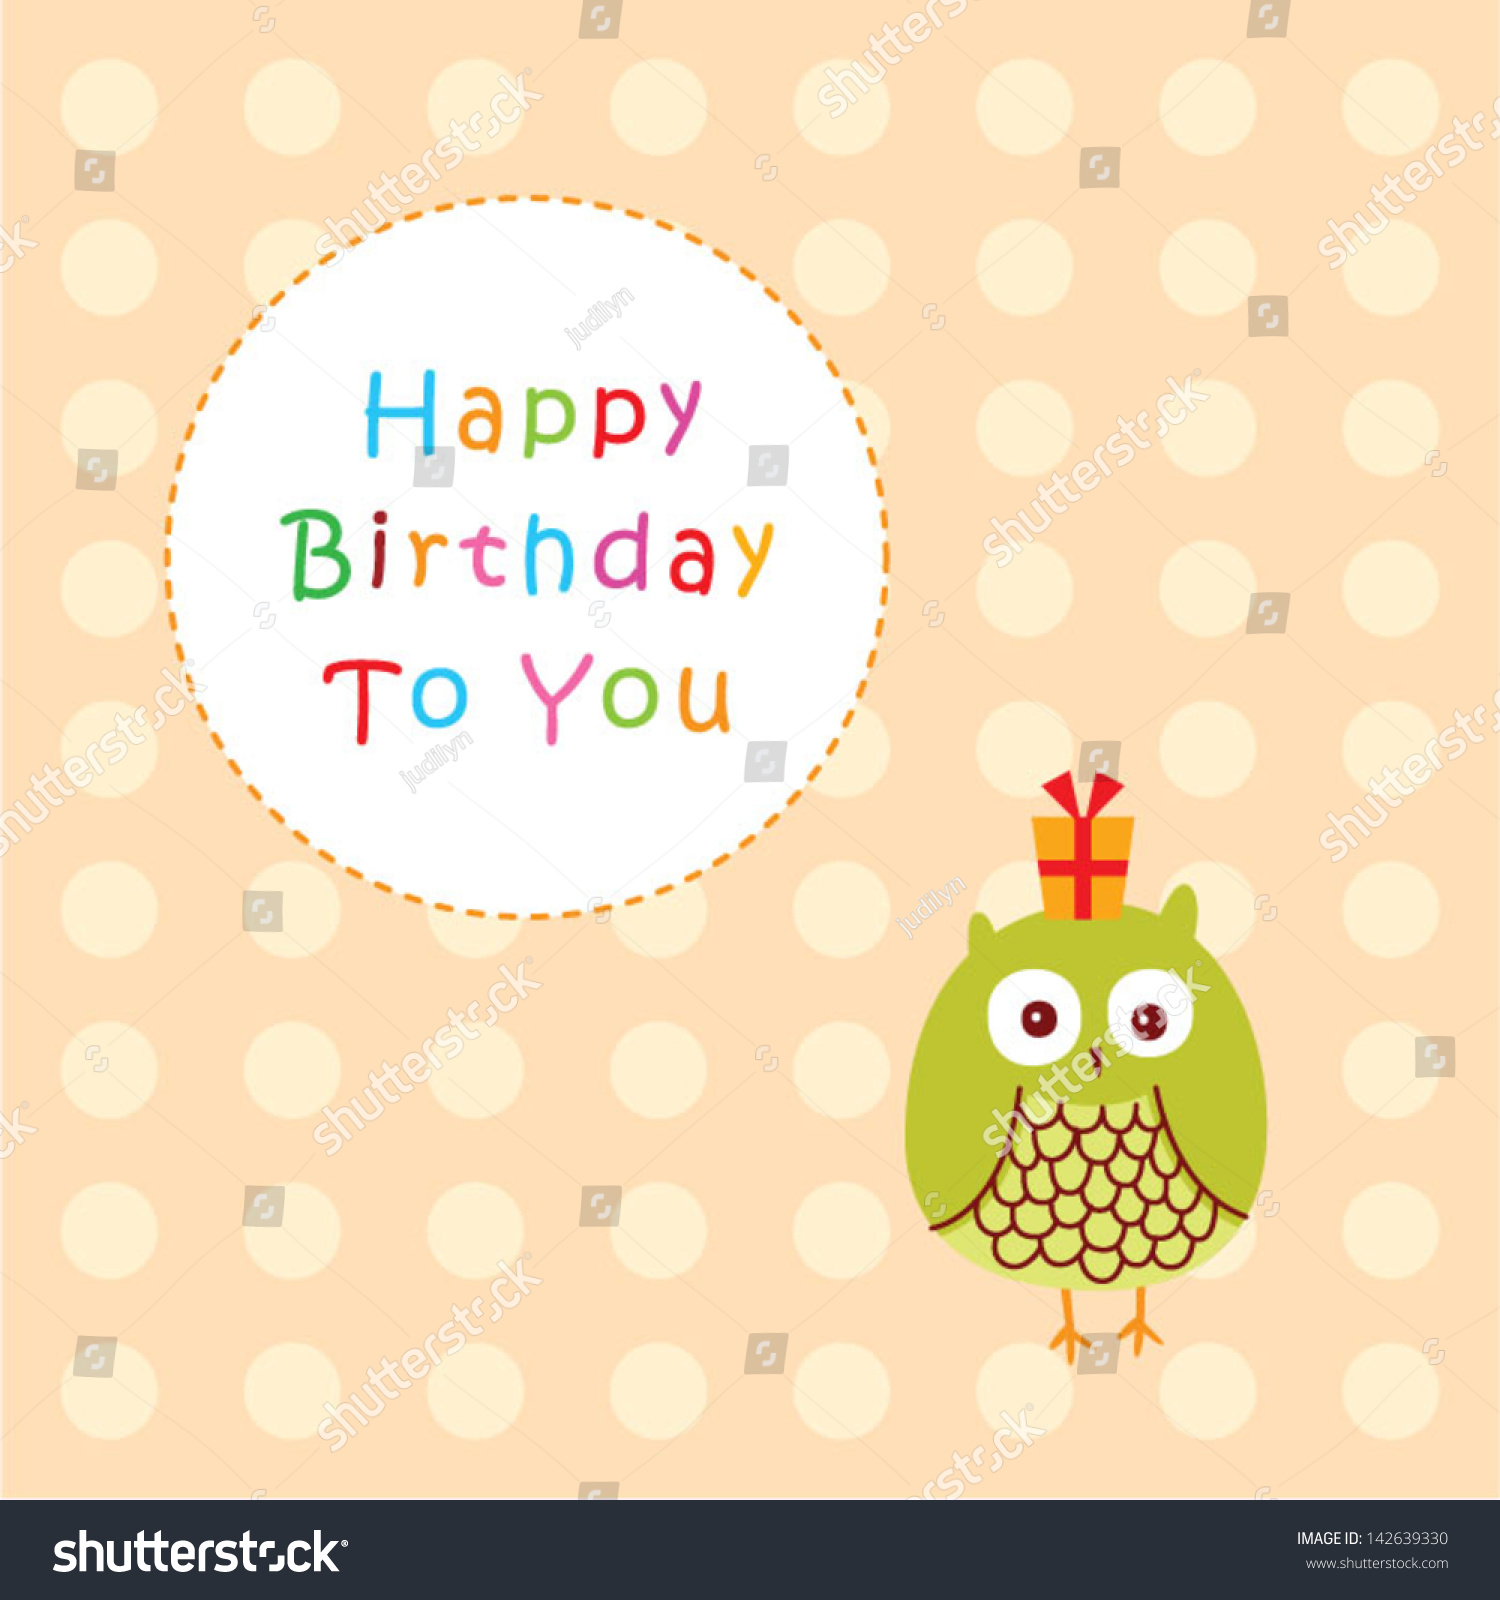 Cute Little Owl Birthday Greeting Stock Vector 142639330 Shutterstock